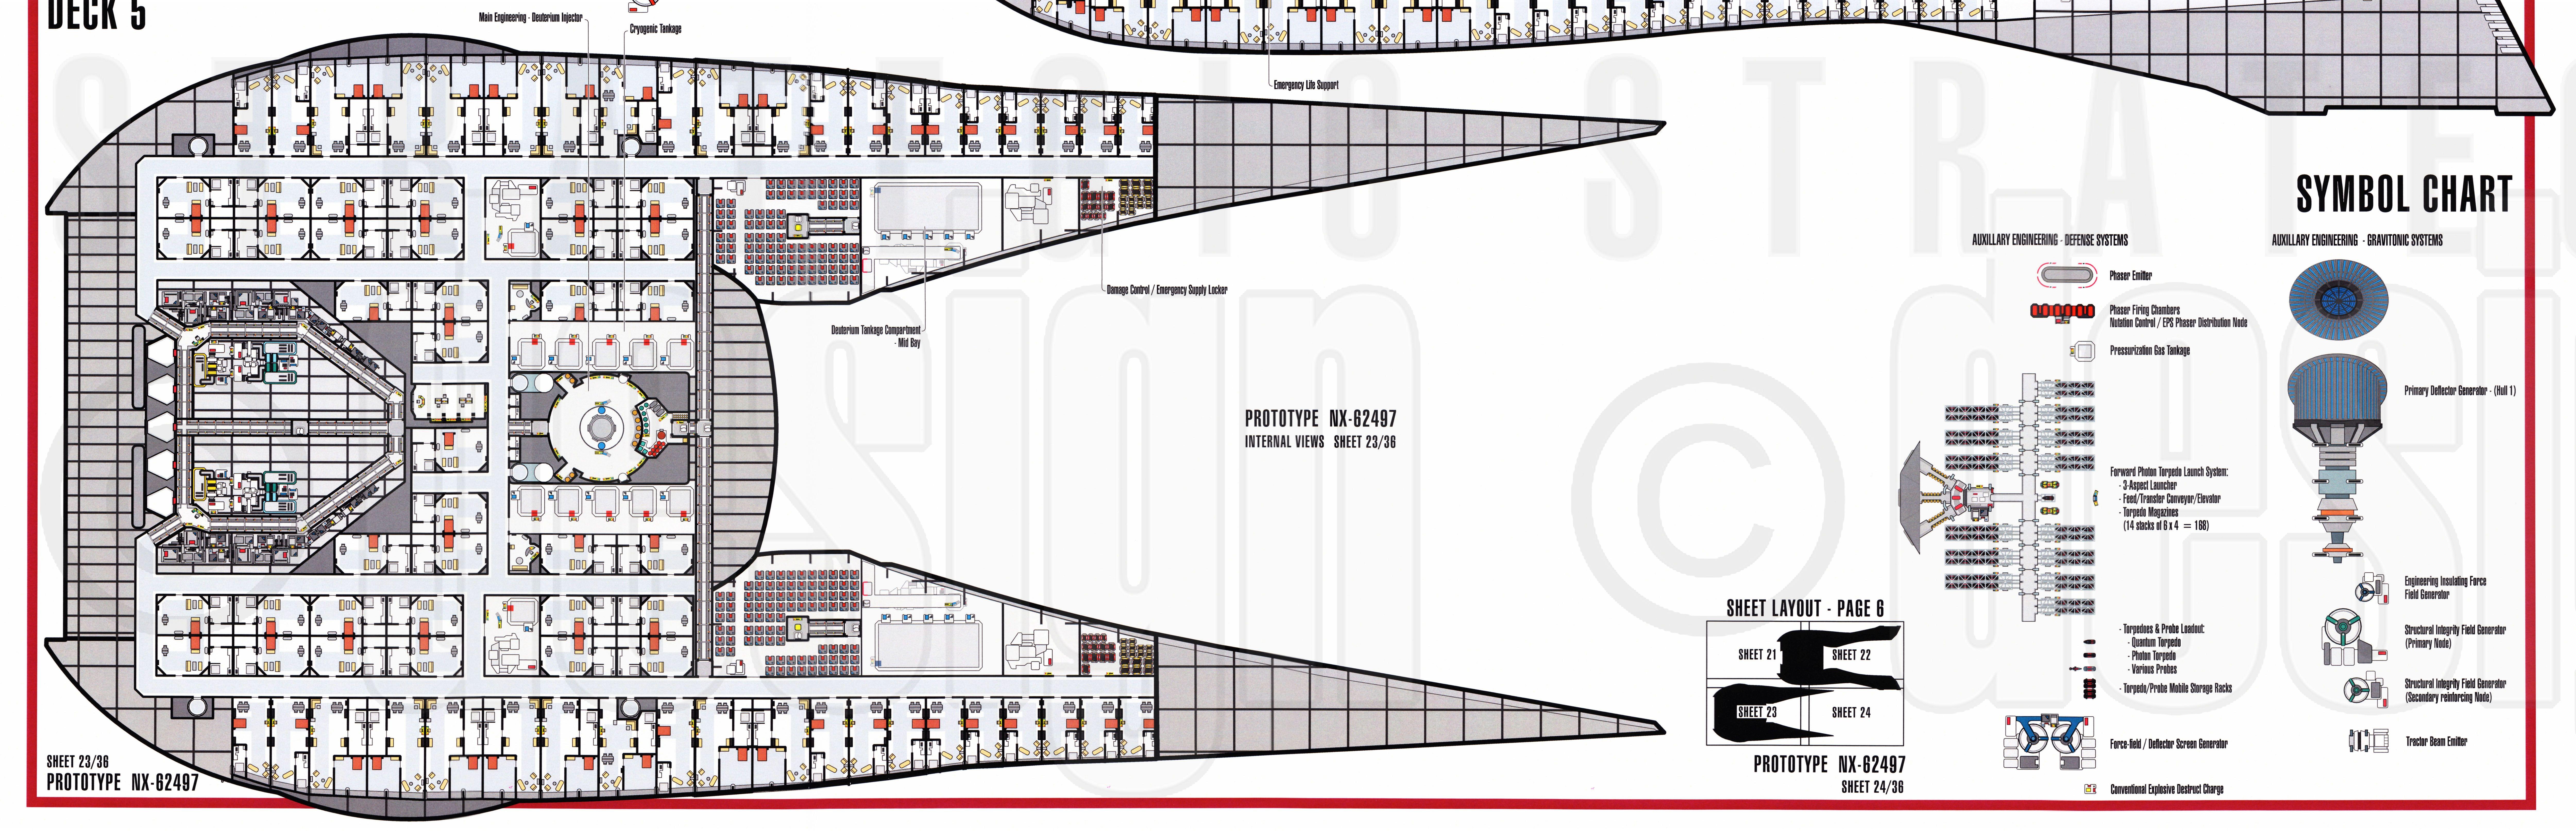 Star Trek Blueprints U S S Akira Nx 62497 Rh Cygnus X1 Net Prometheus Class Starship  Deck Plans Sovereign  Class Starship Deck Plans